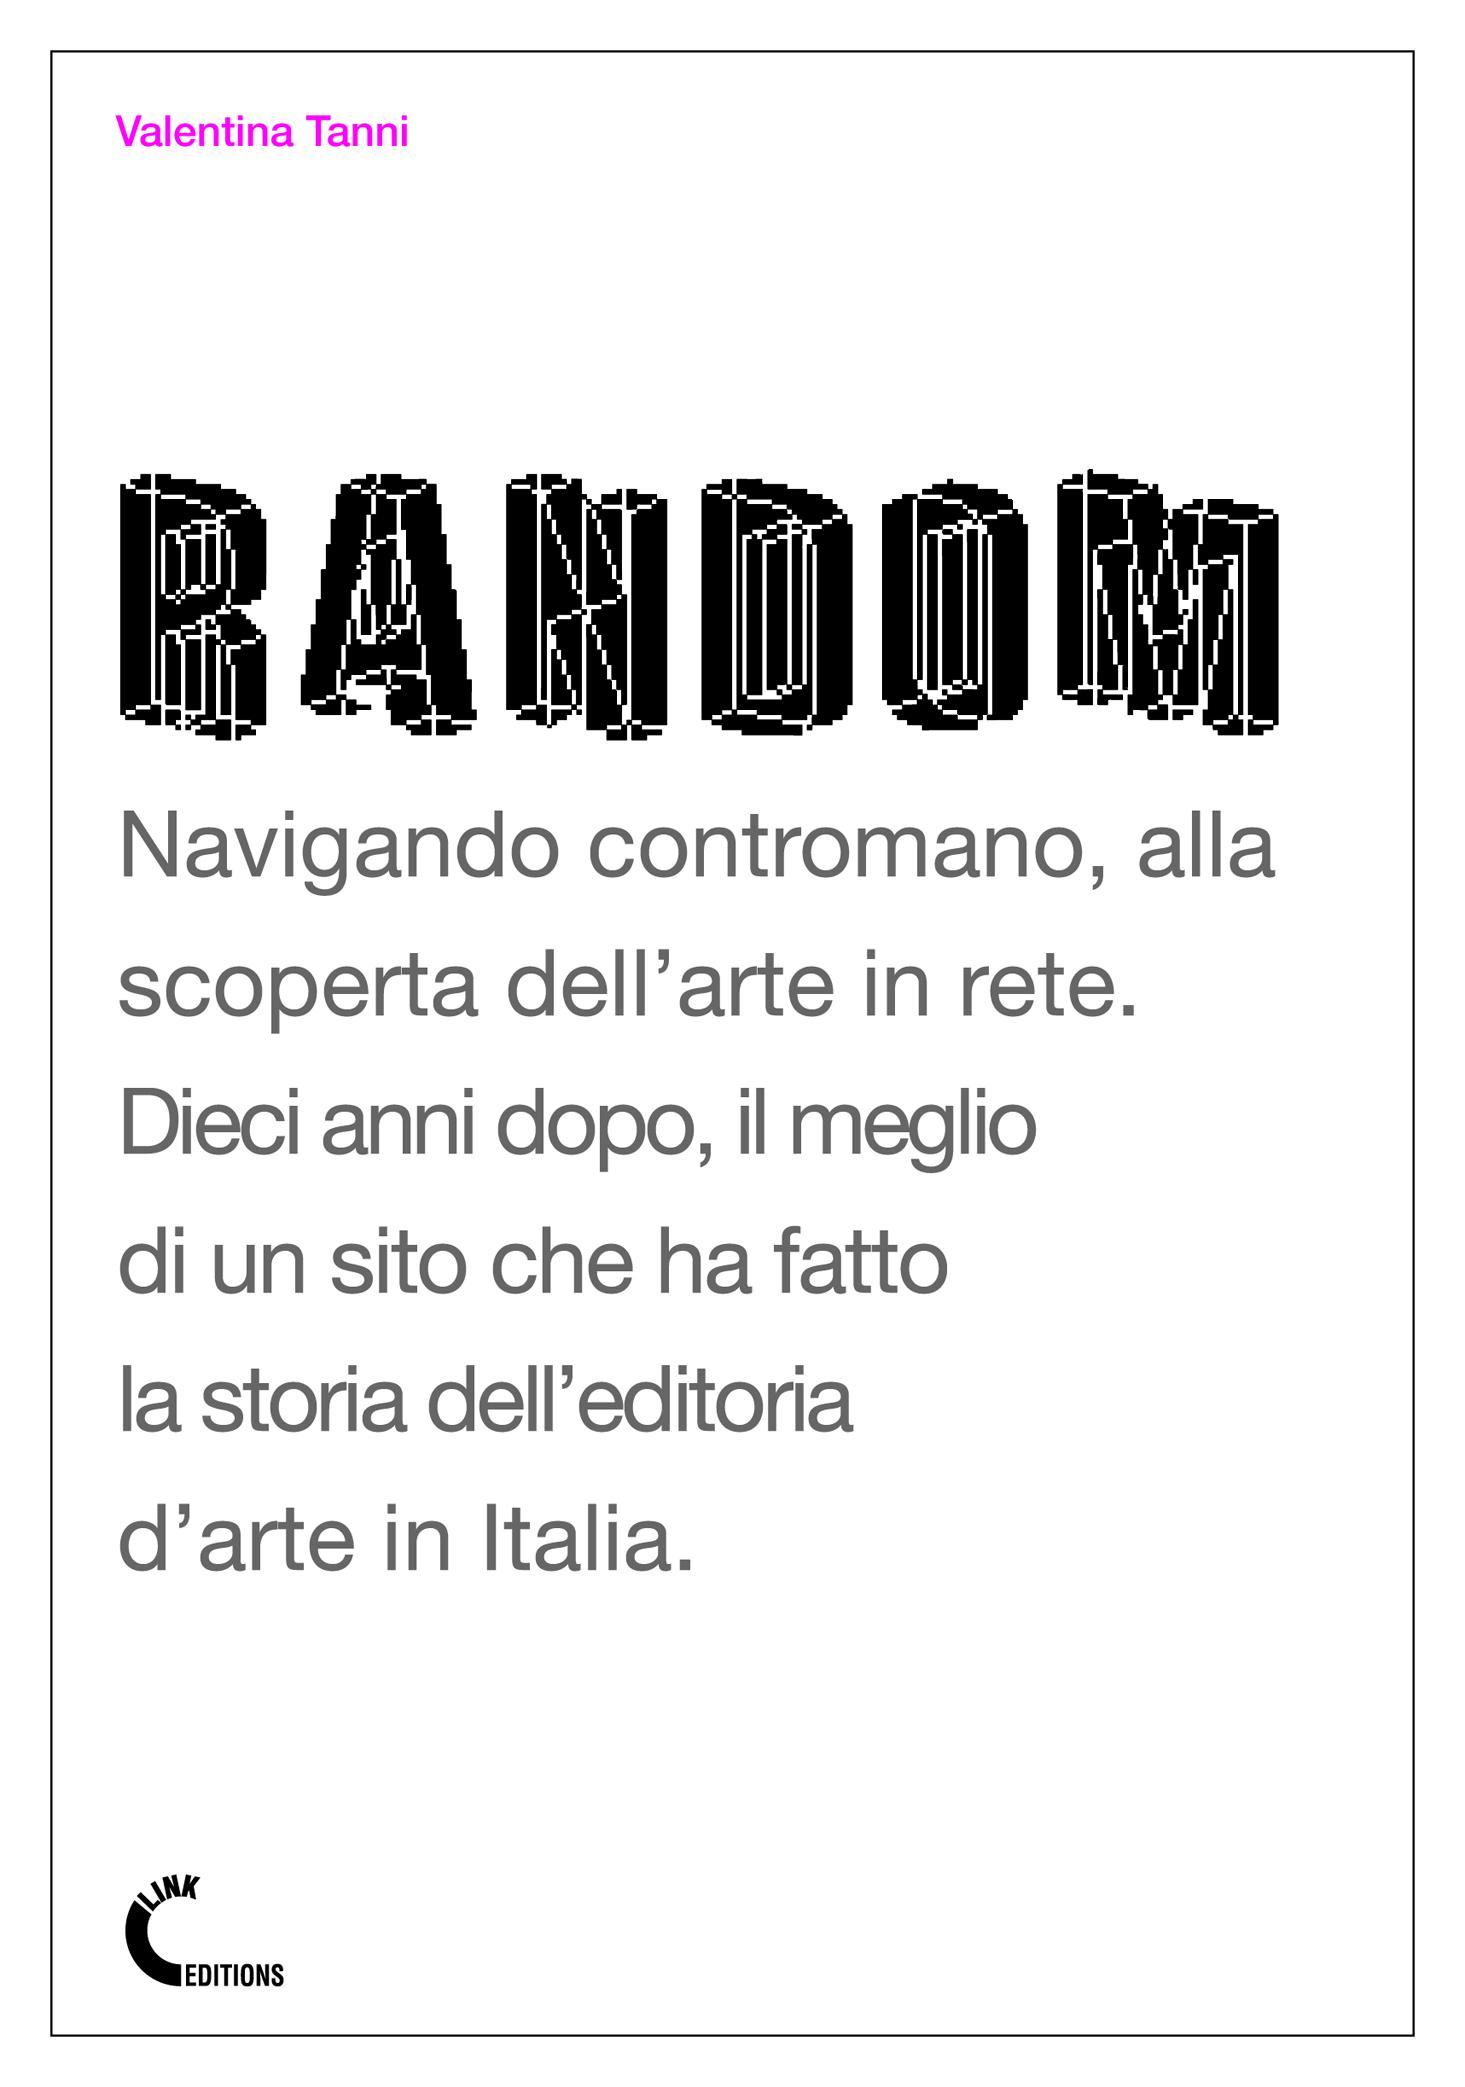 2011 / Random Magazine: the book